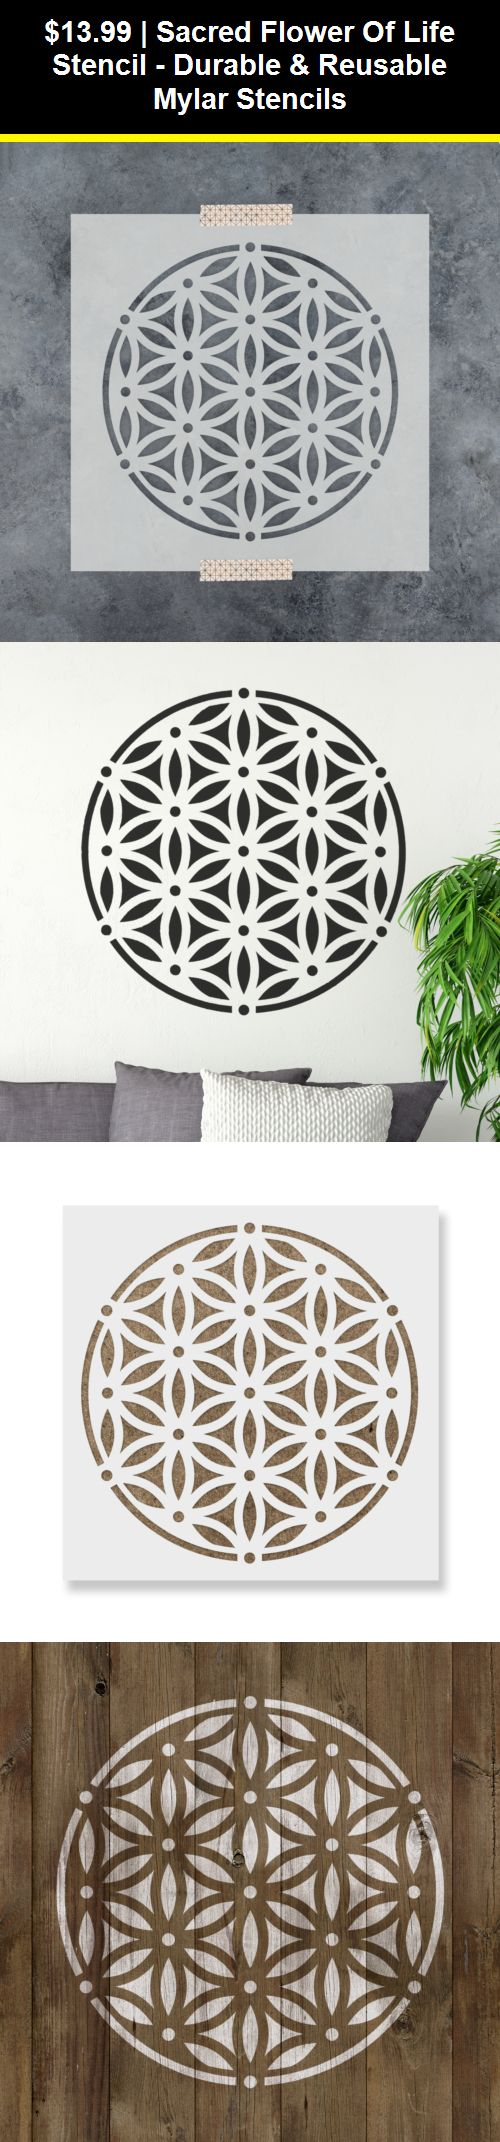 Durable /& Reusable Mylar Stencils Sacred Flower of Life Stencil